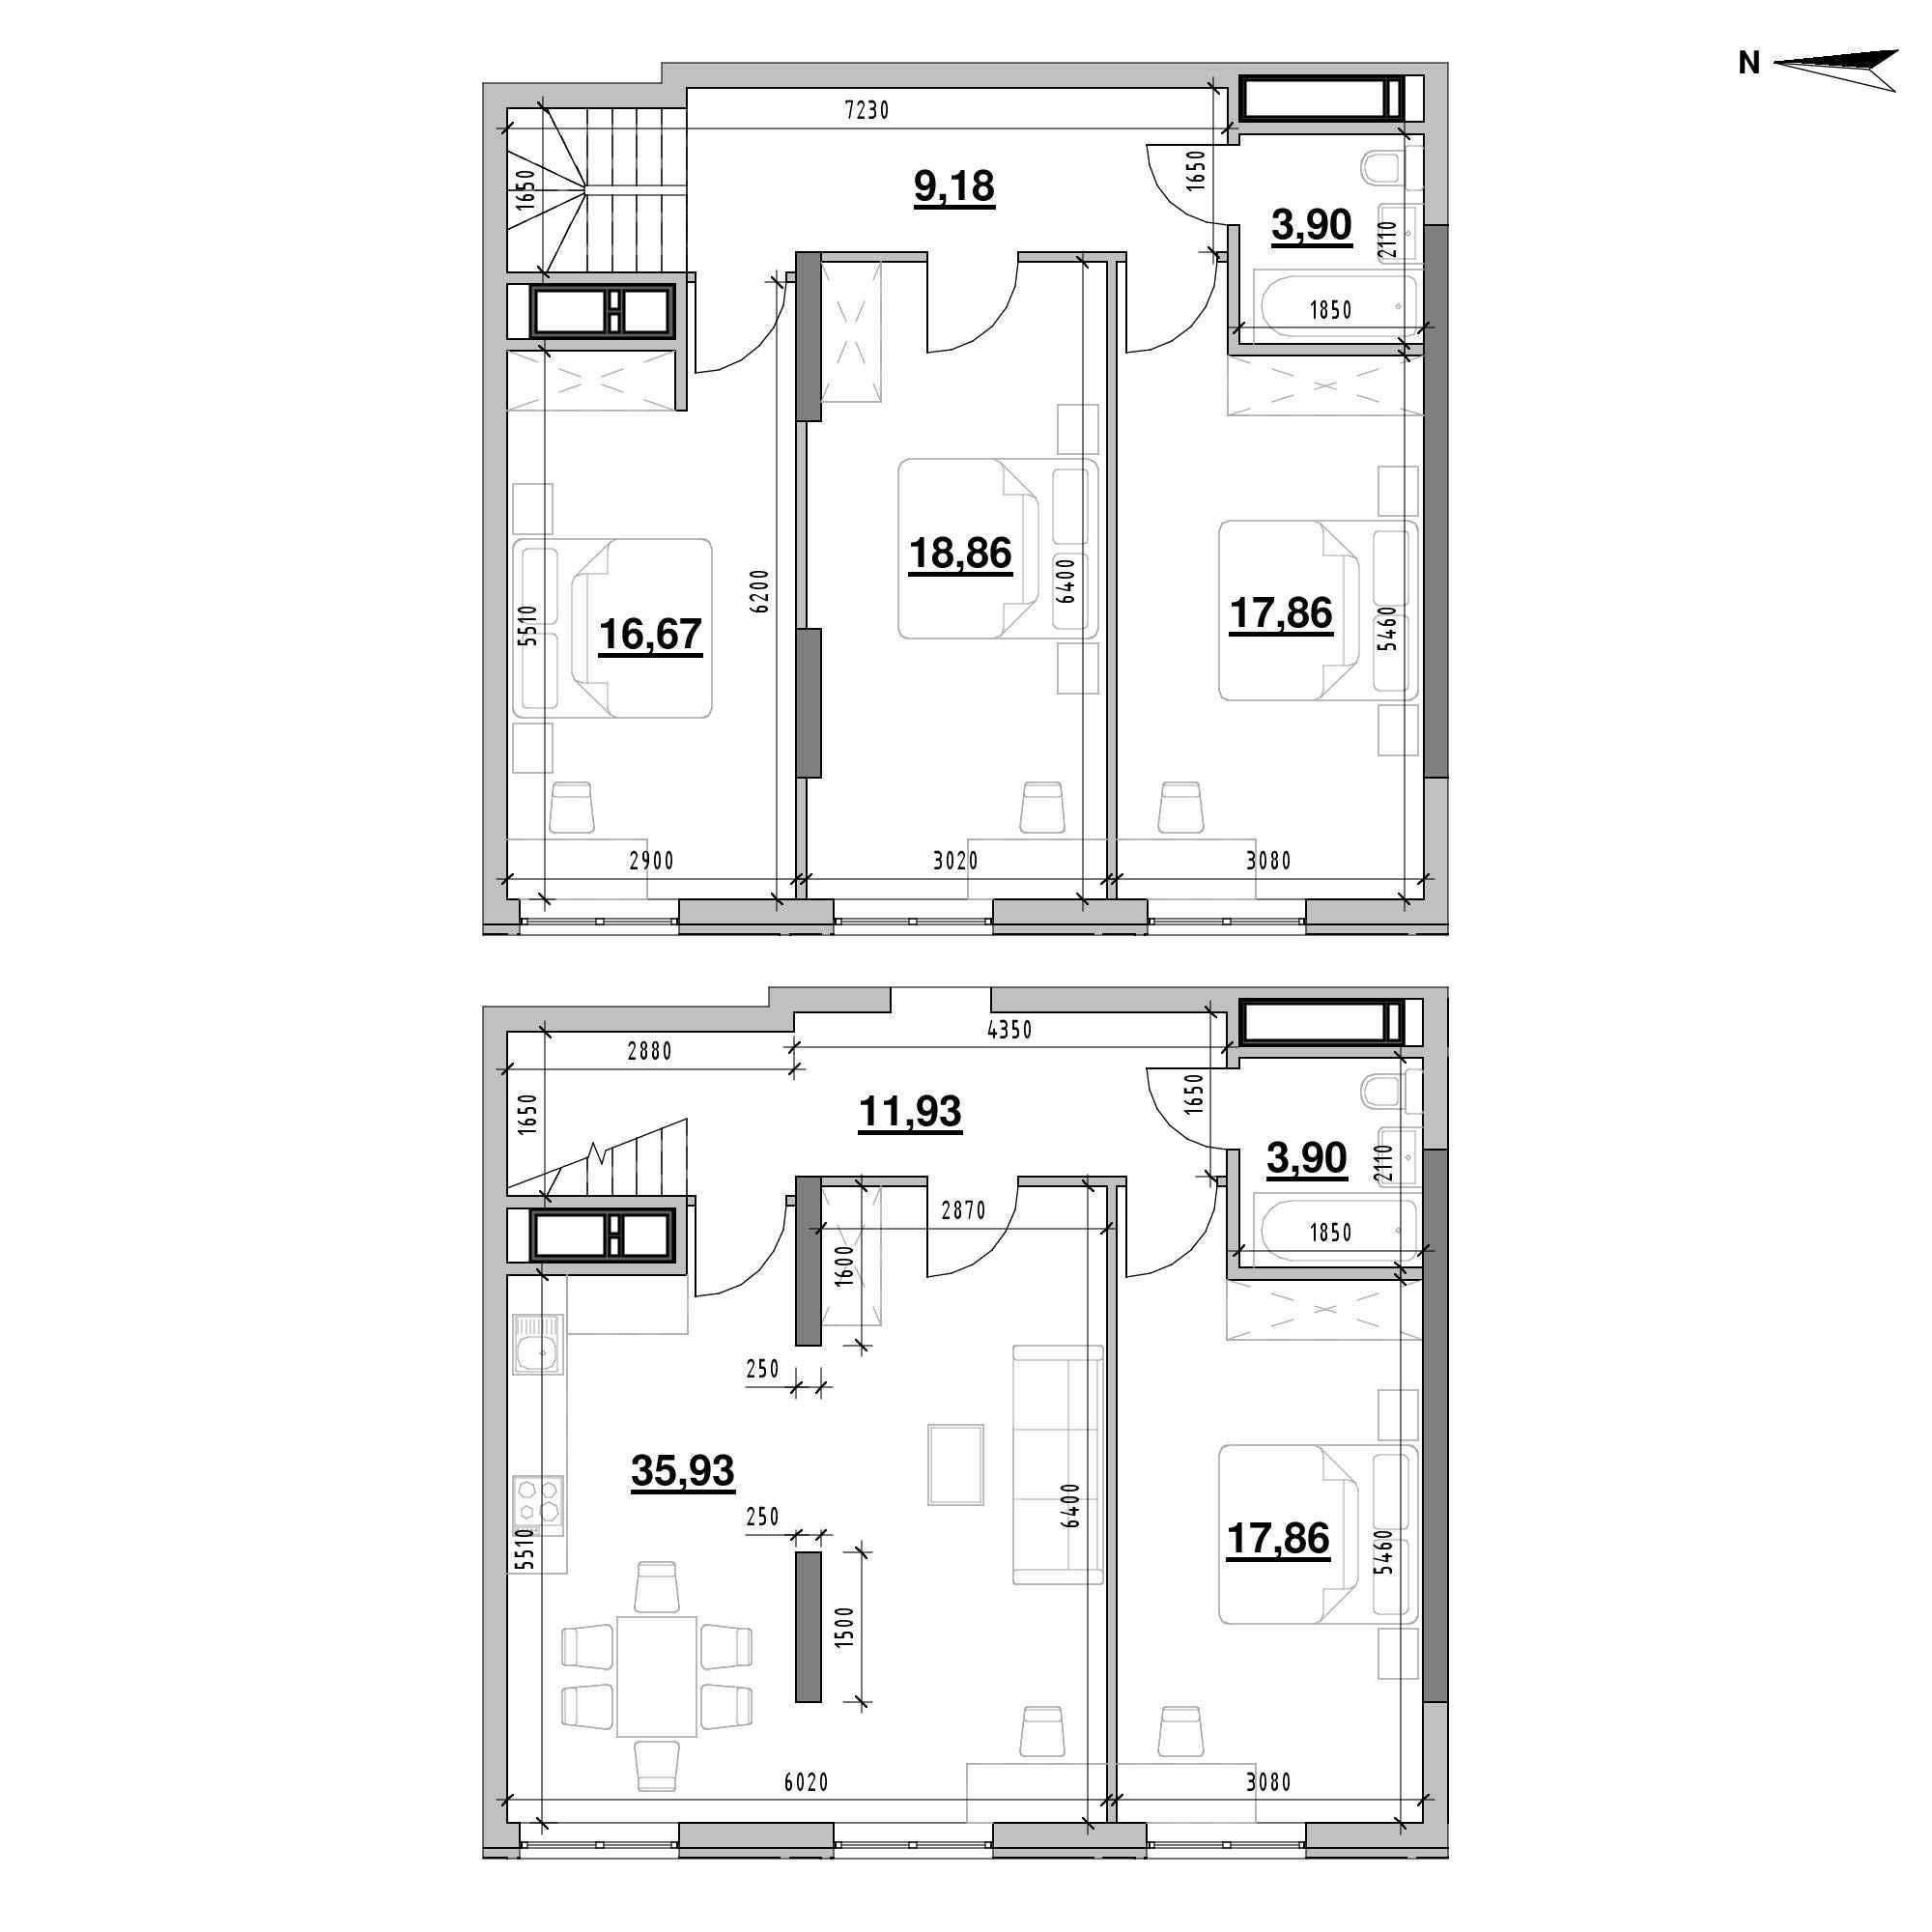 ЖК Nordica Residence: планування 4-кімнатної квартири, №213, 136.09 м<sup>2</sup>